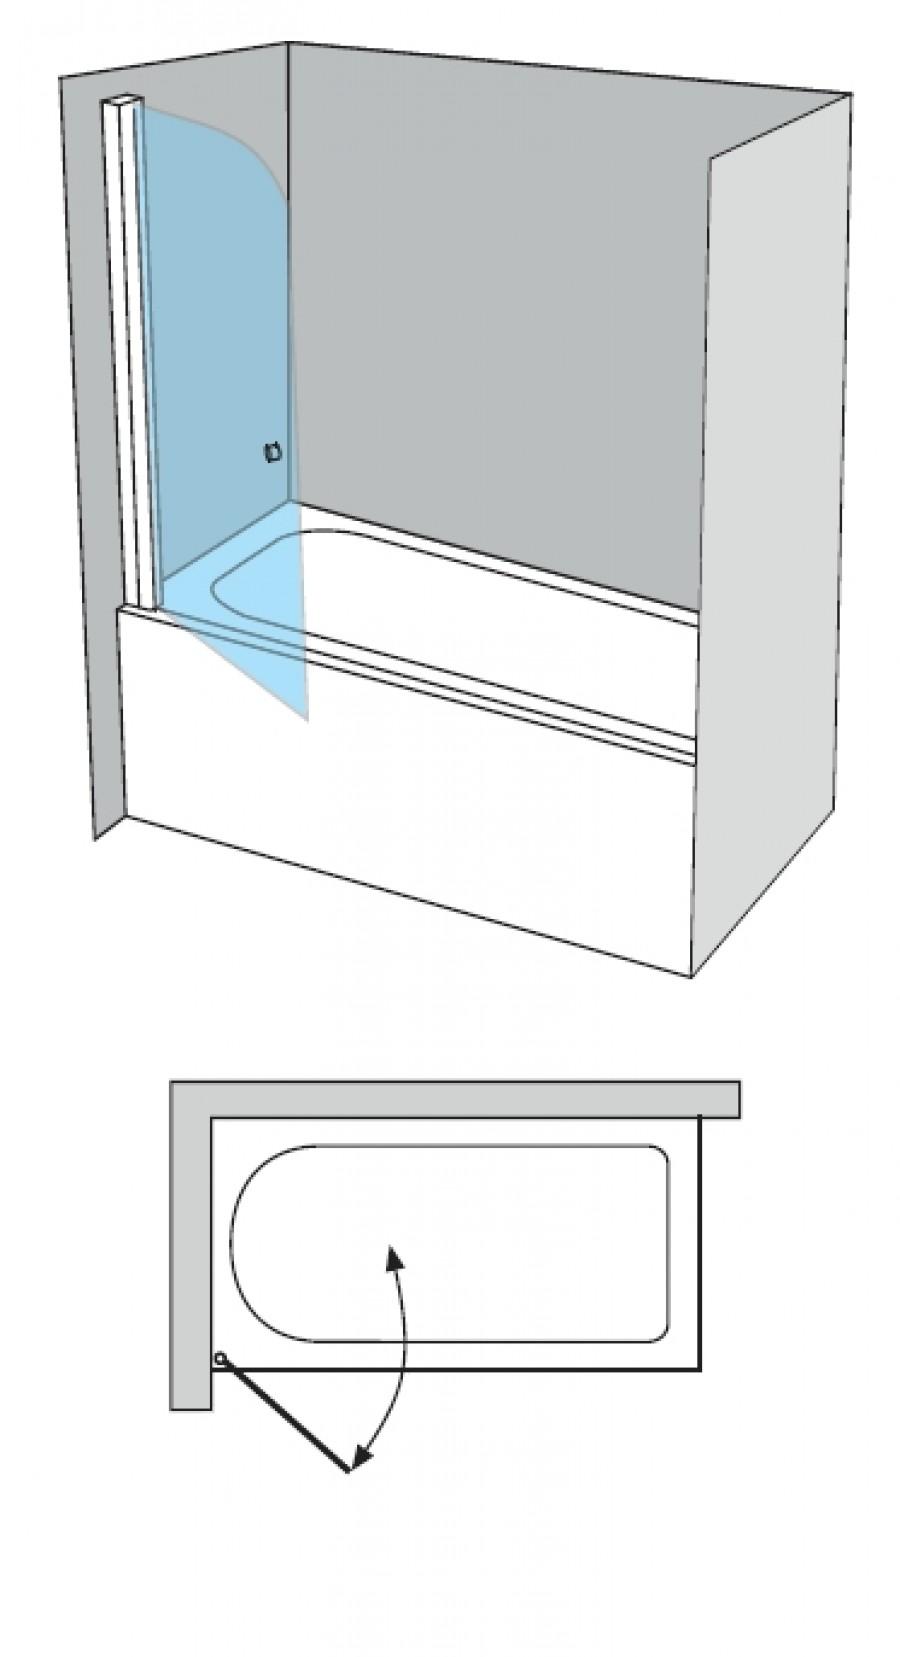 pare bain arcoiris pivotant verre fum sabl aqua 90x150. Black Bedroom Furniture Sets. Home Design Ideas